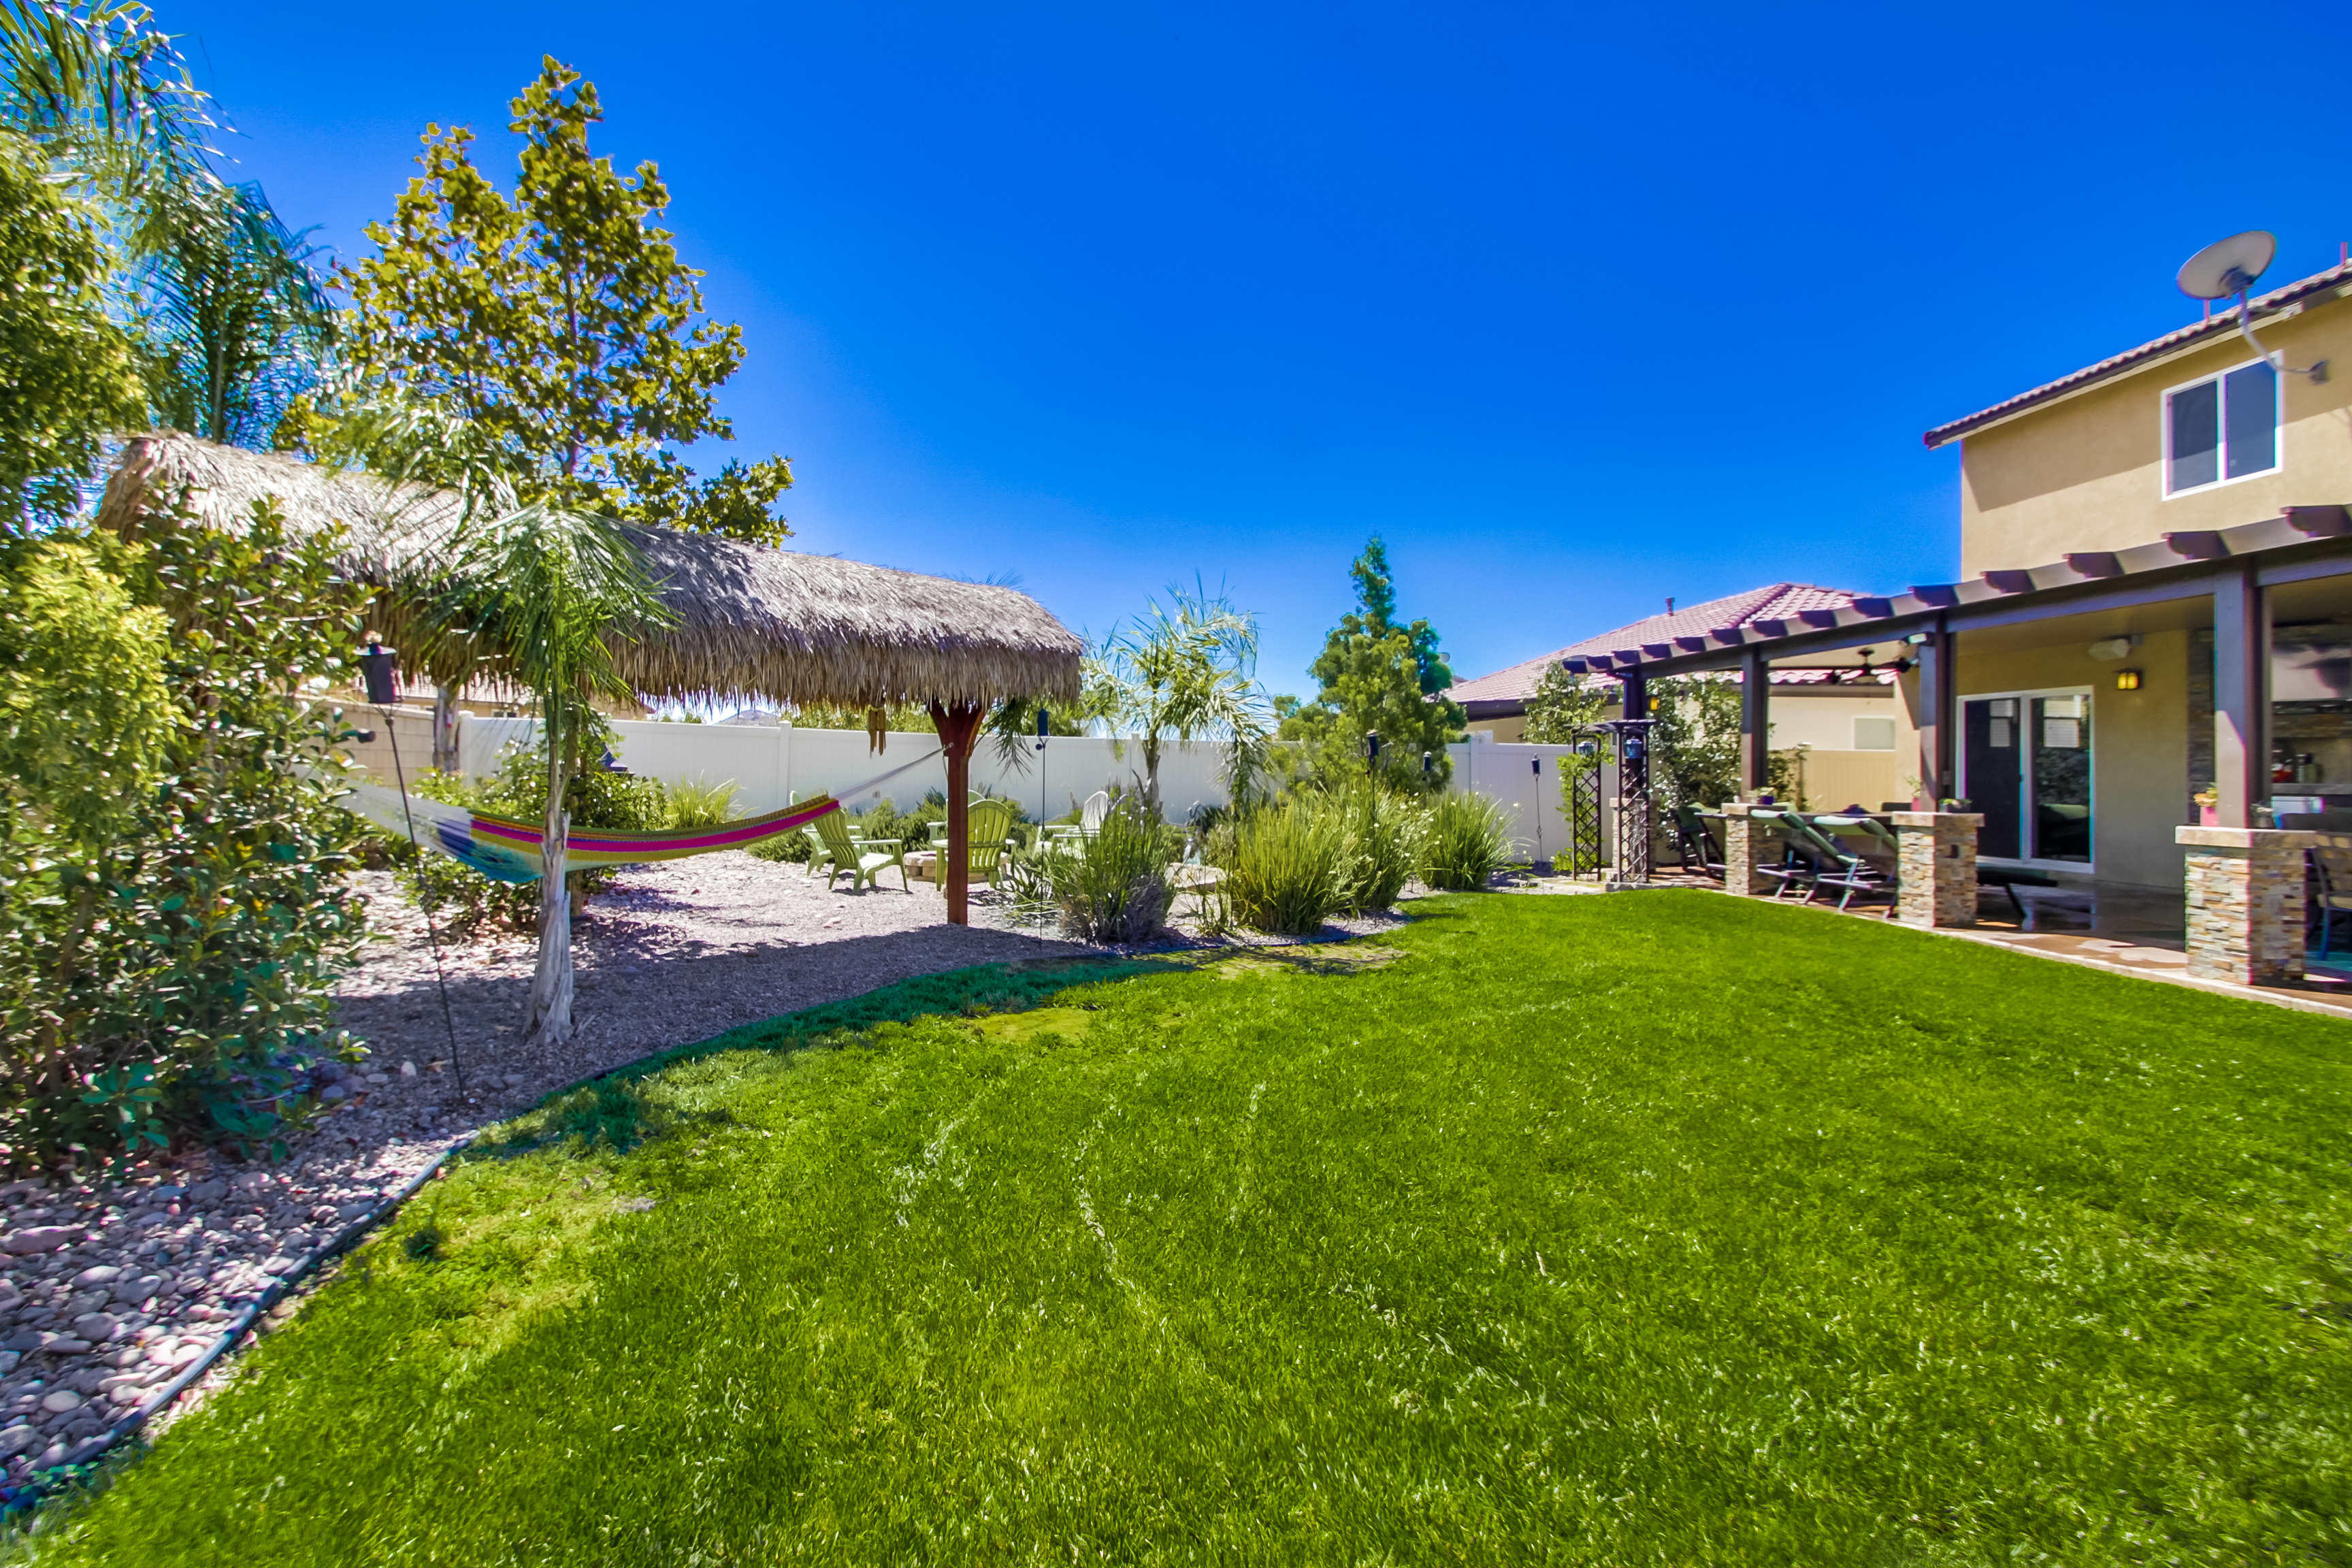 Single Family Home for Sale at 29278 Pineleaf Street Menifee, California 92584 United States